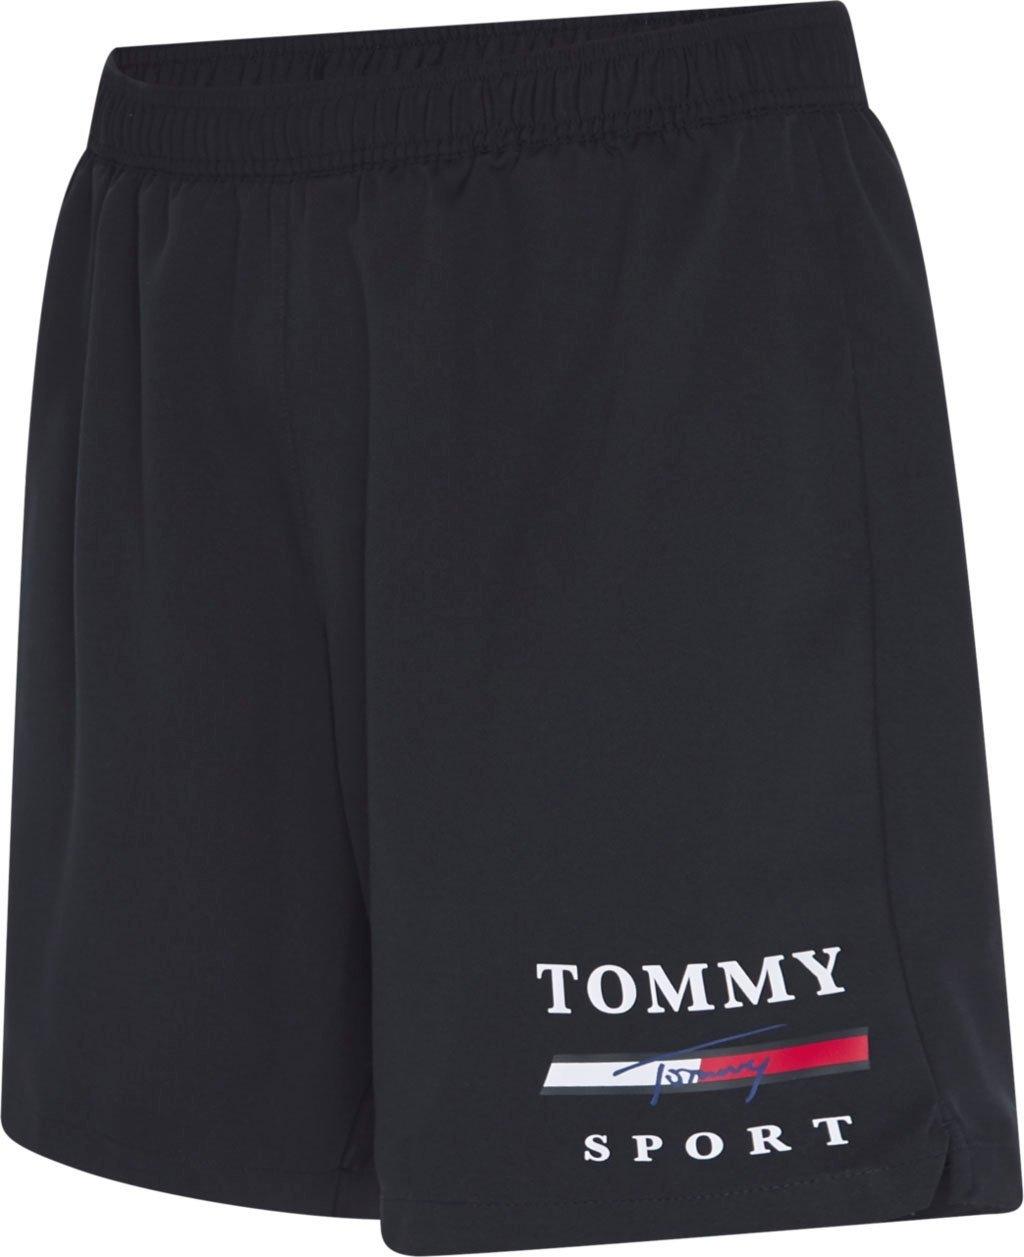 TOMMY SPORT trainingsshort »GRAPHIC WOVEN SHORT 7« bij OTTO online kopen